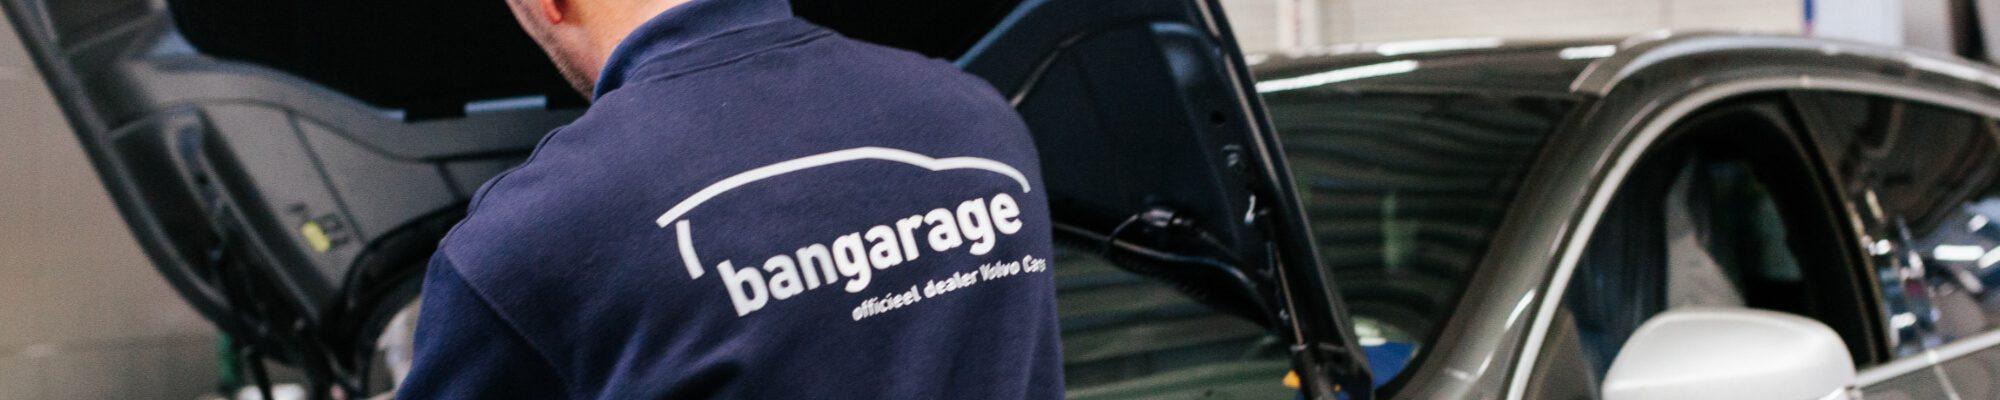 Volvo Bangarage Personal Service